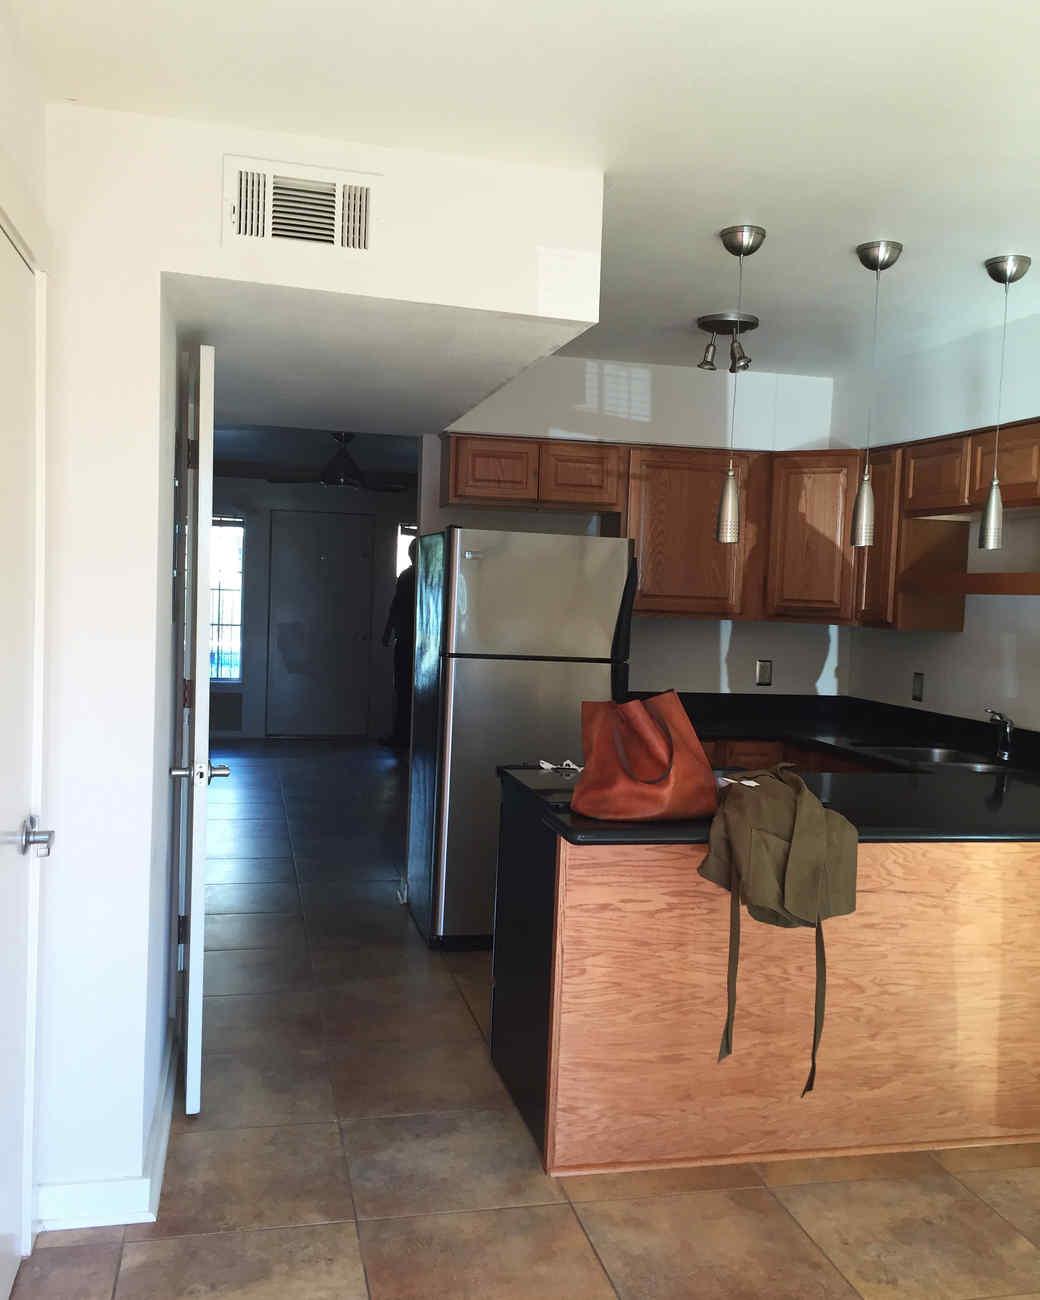 1-kitchen-entry-before.jpg